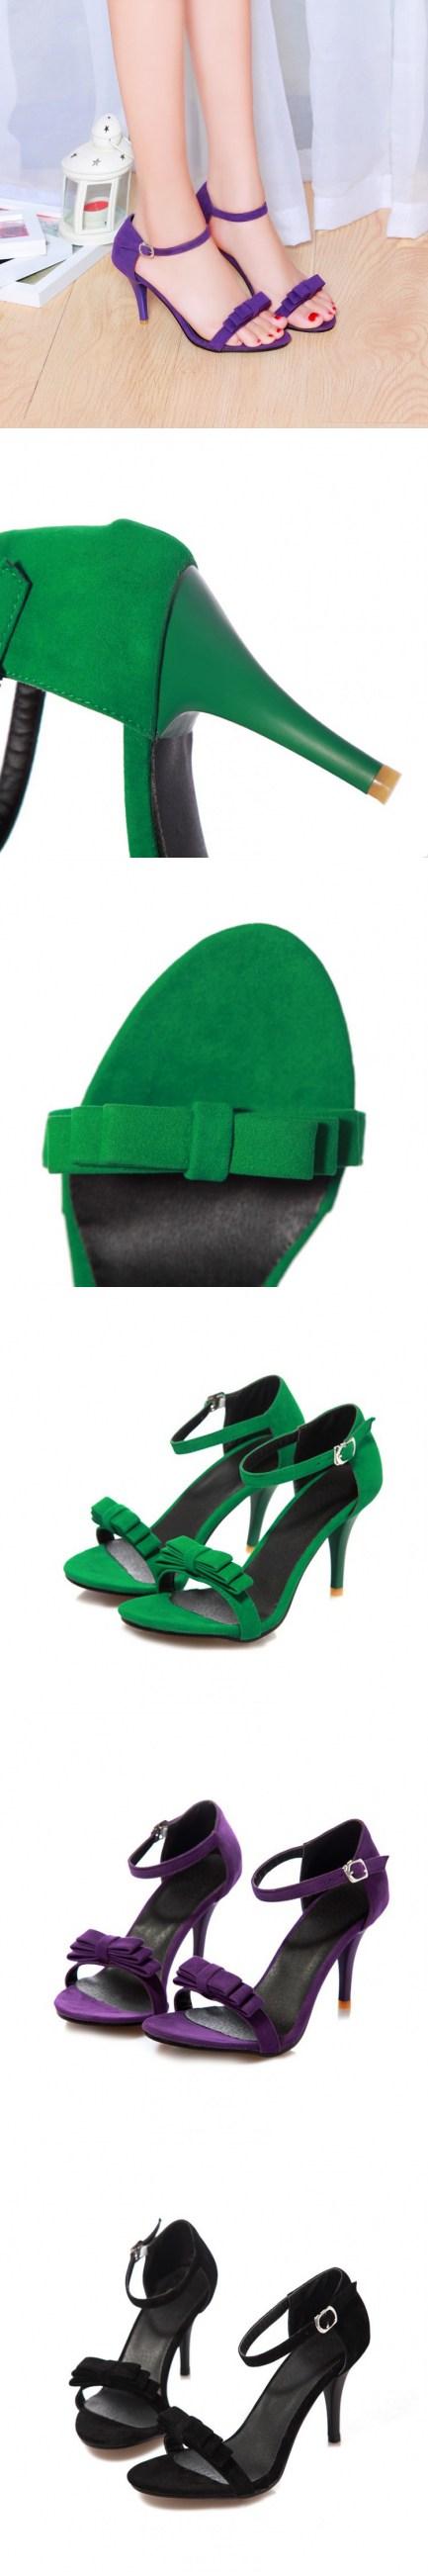 Mature ebony in heels